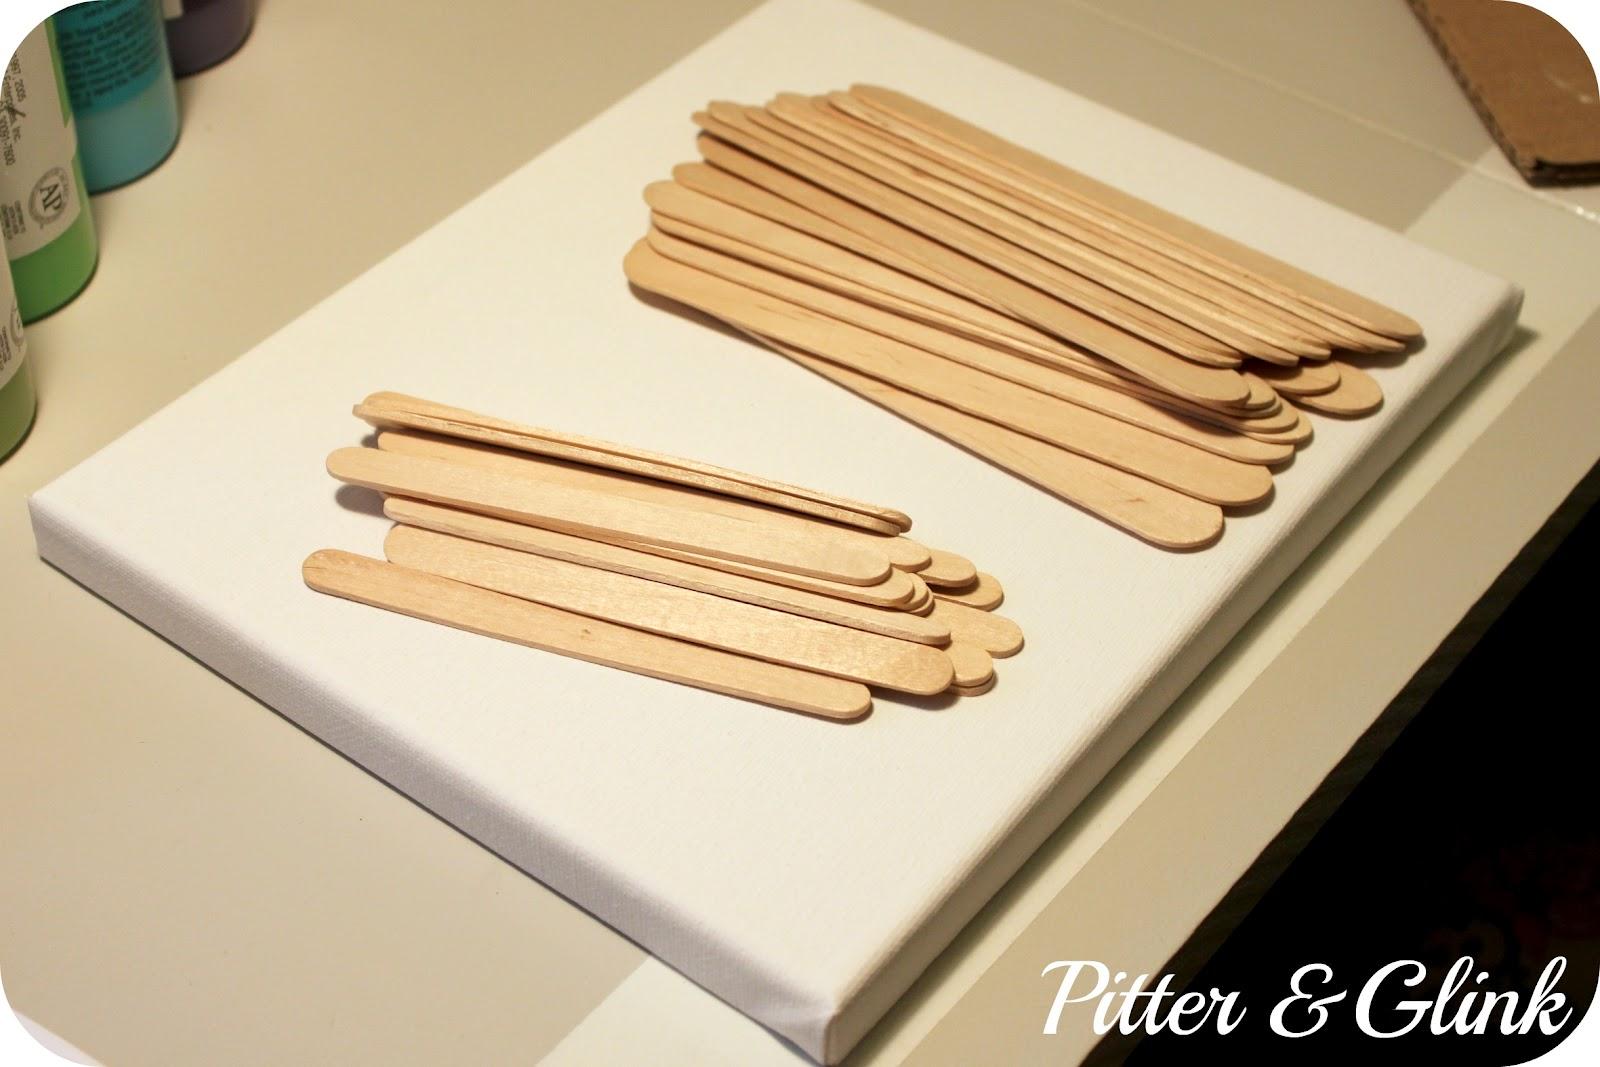 PitterAndGlink: {Upscale Summer Popsicle Stick Art}